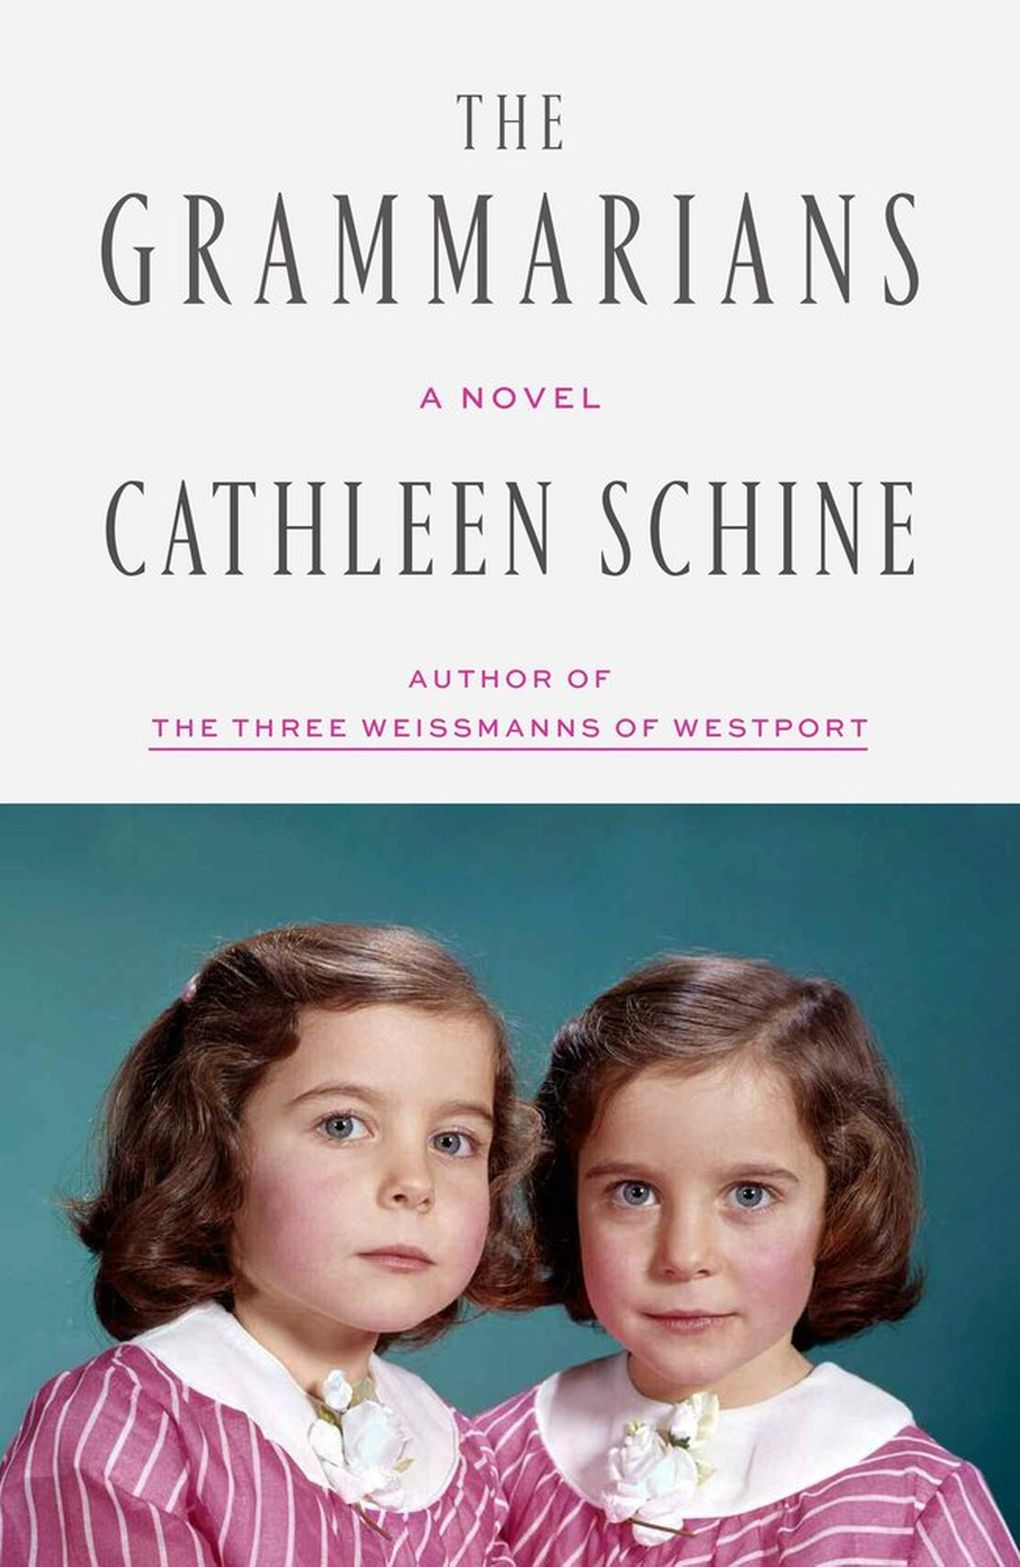 """The Grammarians"" by Cathleen Schine (Macmillan Publishers)"